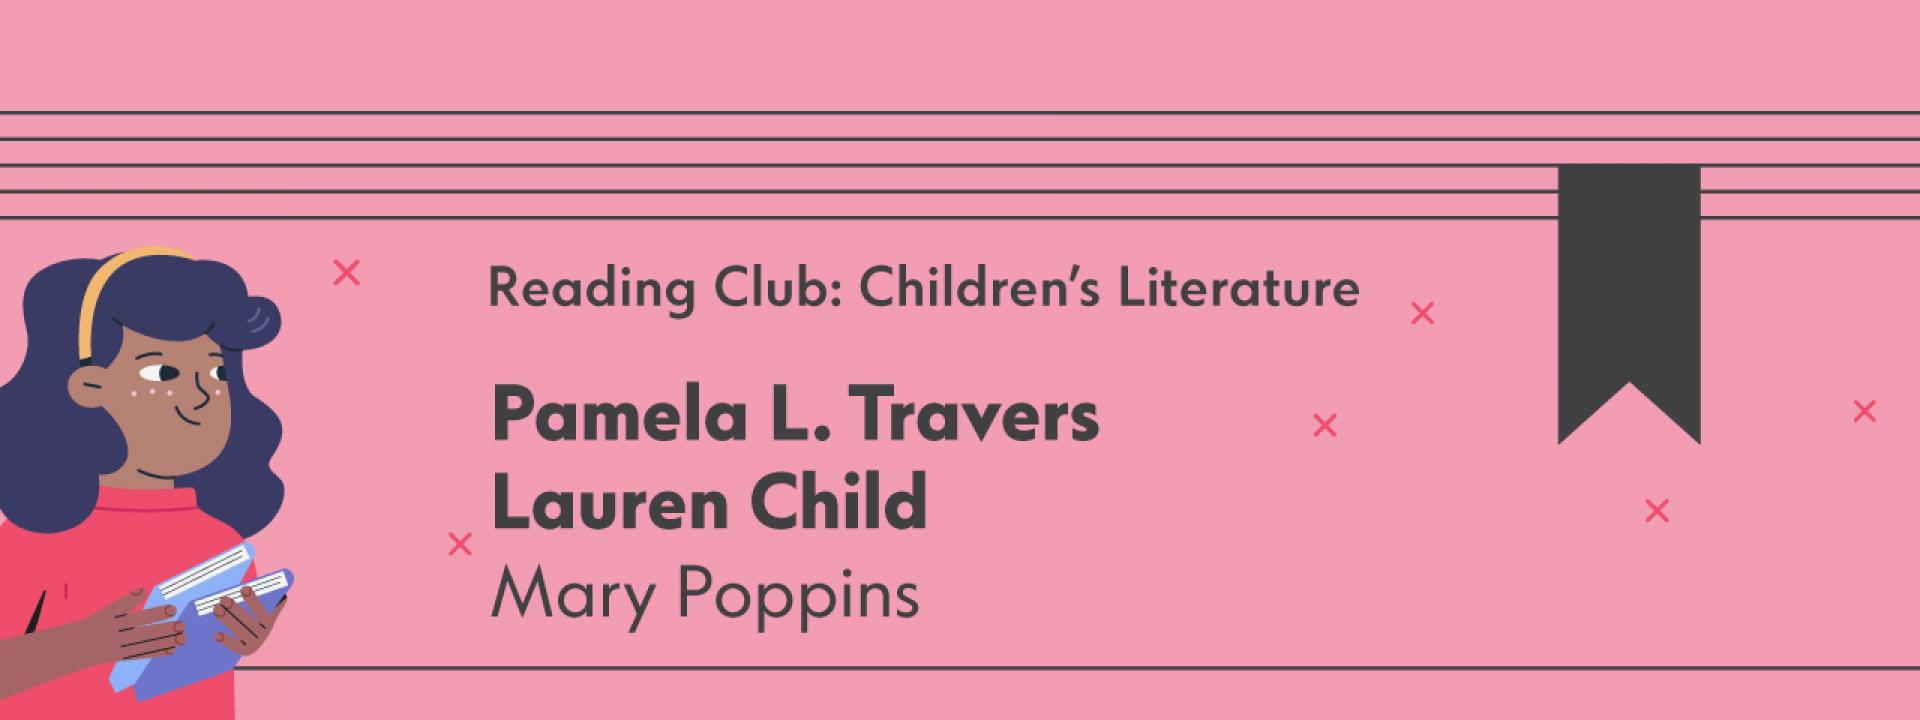 Reading Club: Children's Literature   Mary Poppins - Εικόνα